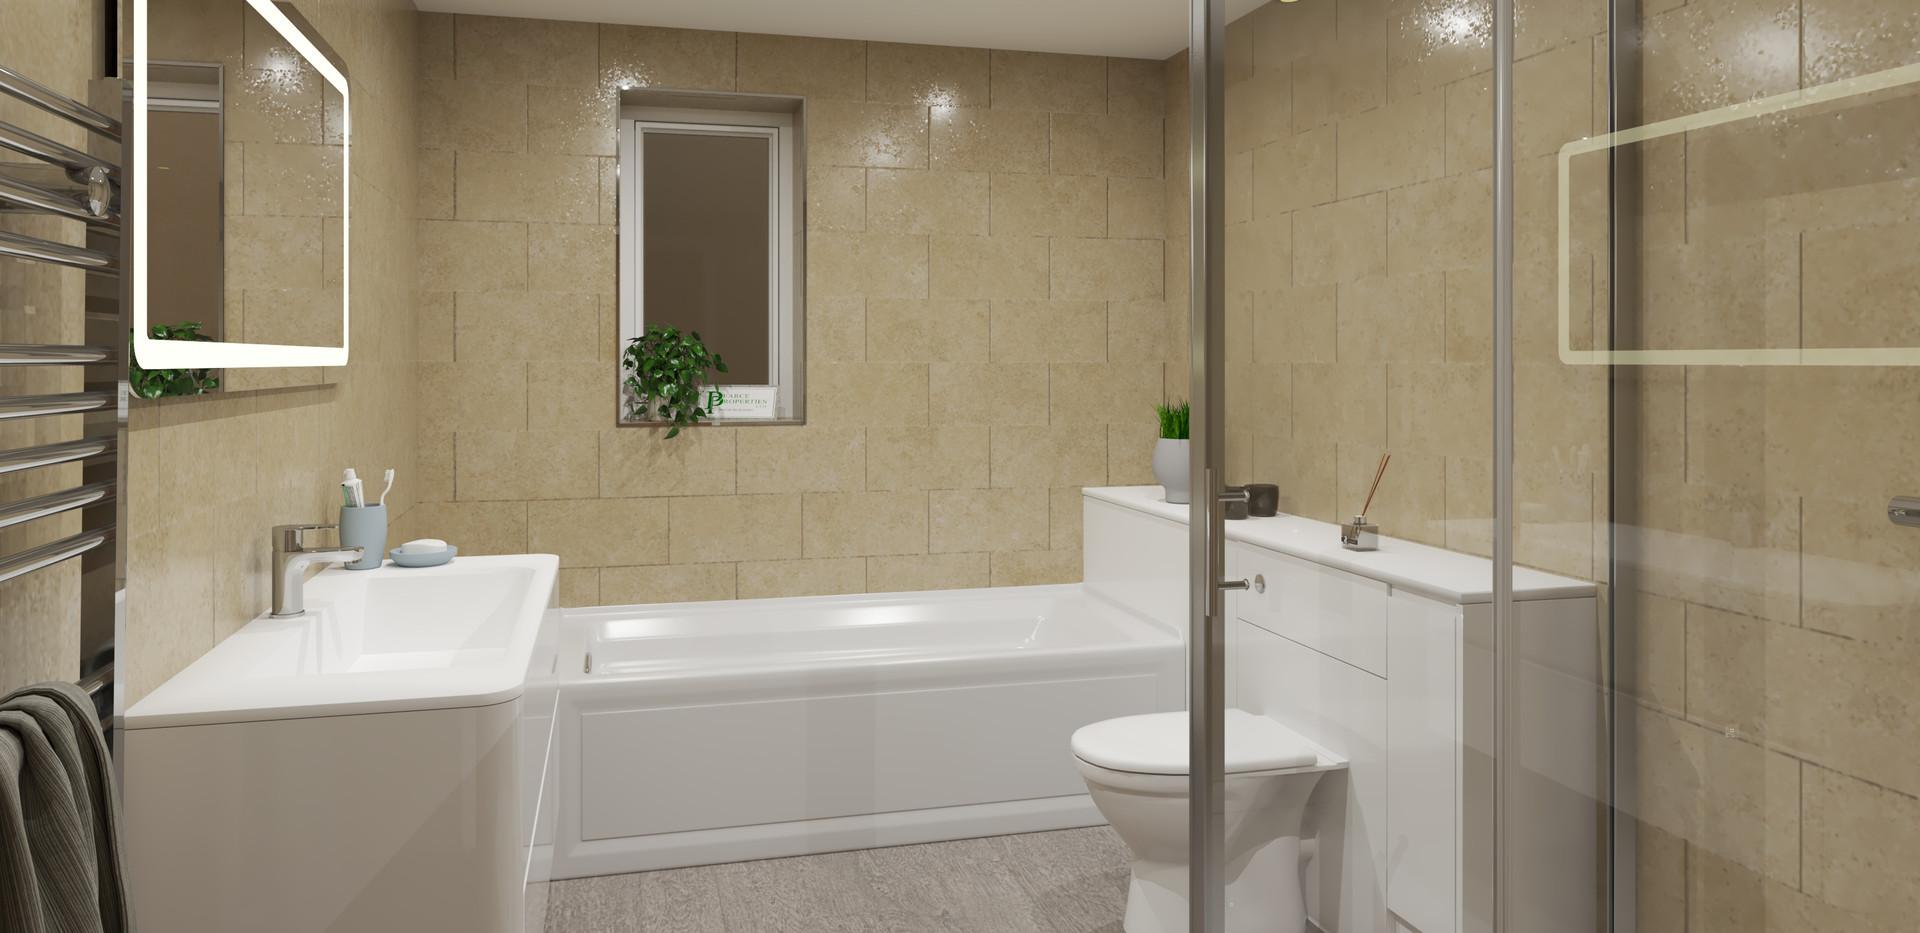 Plot 2 Main bathroom